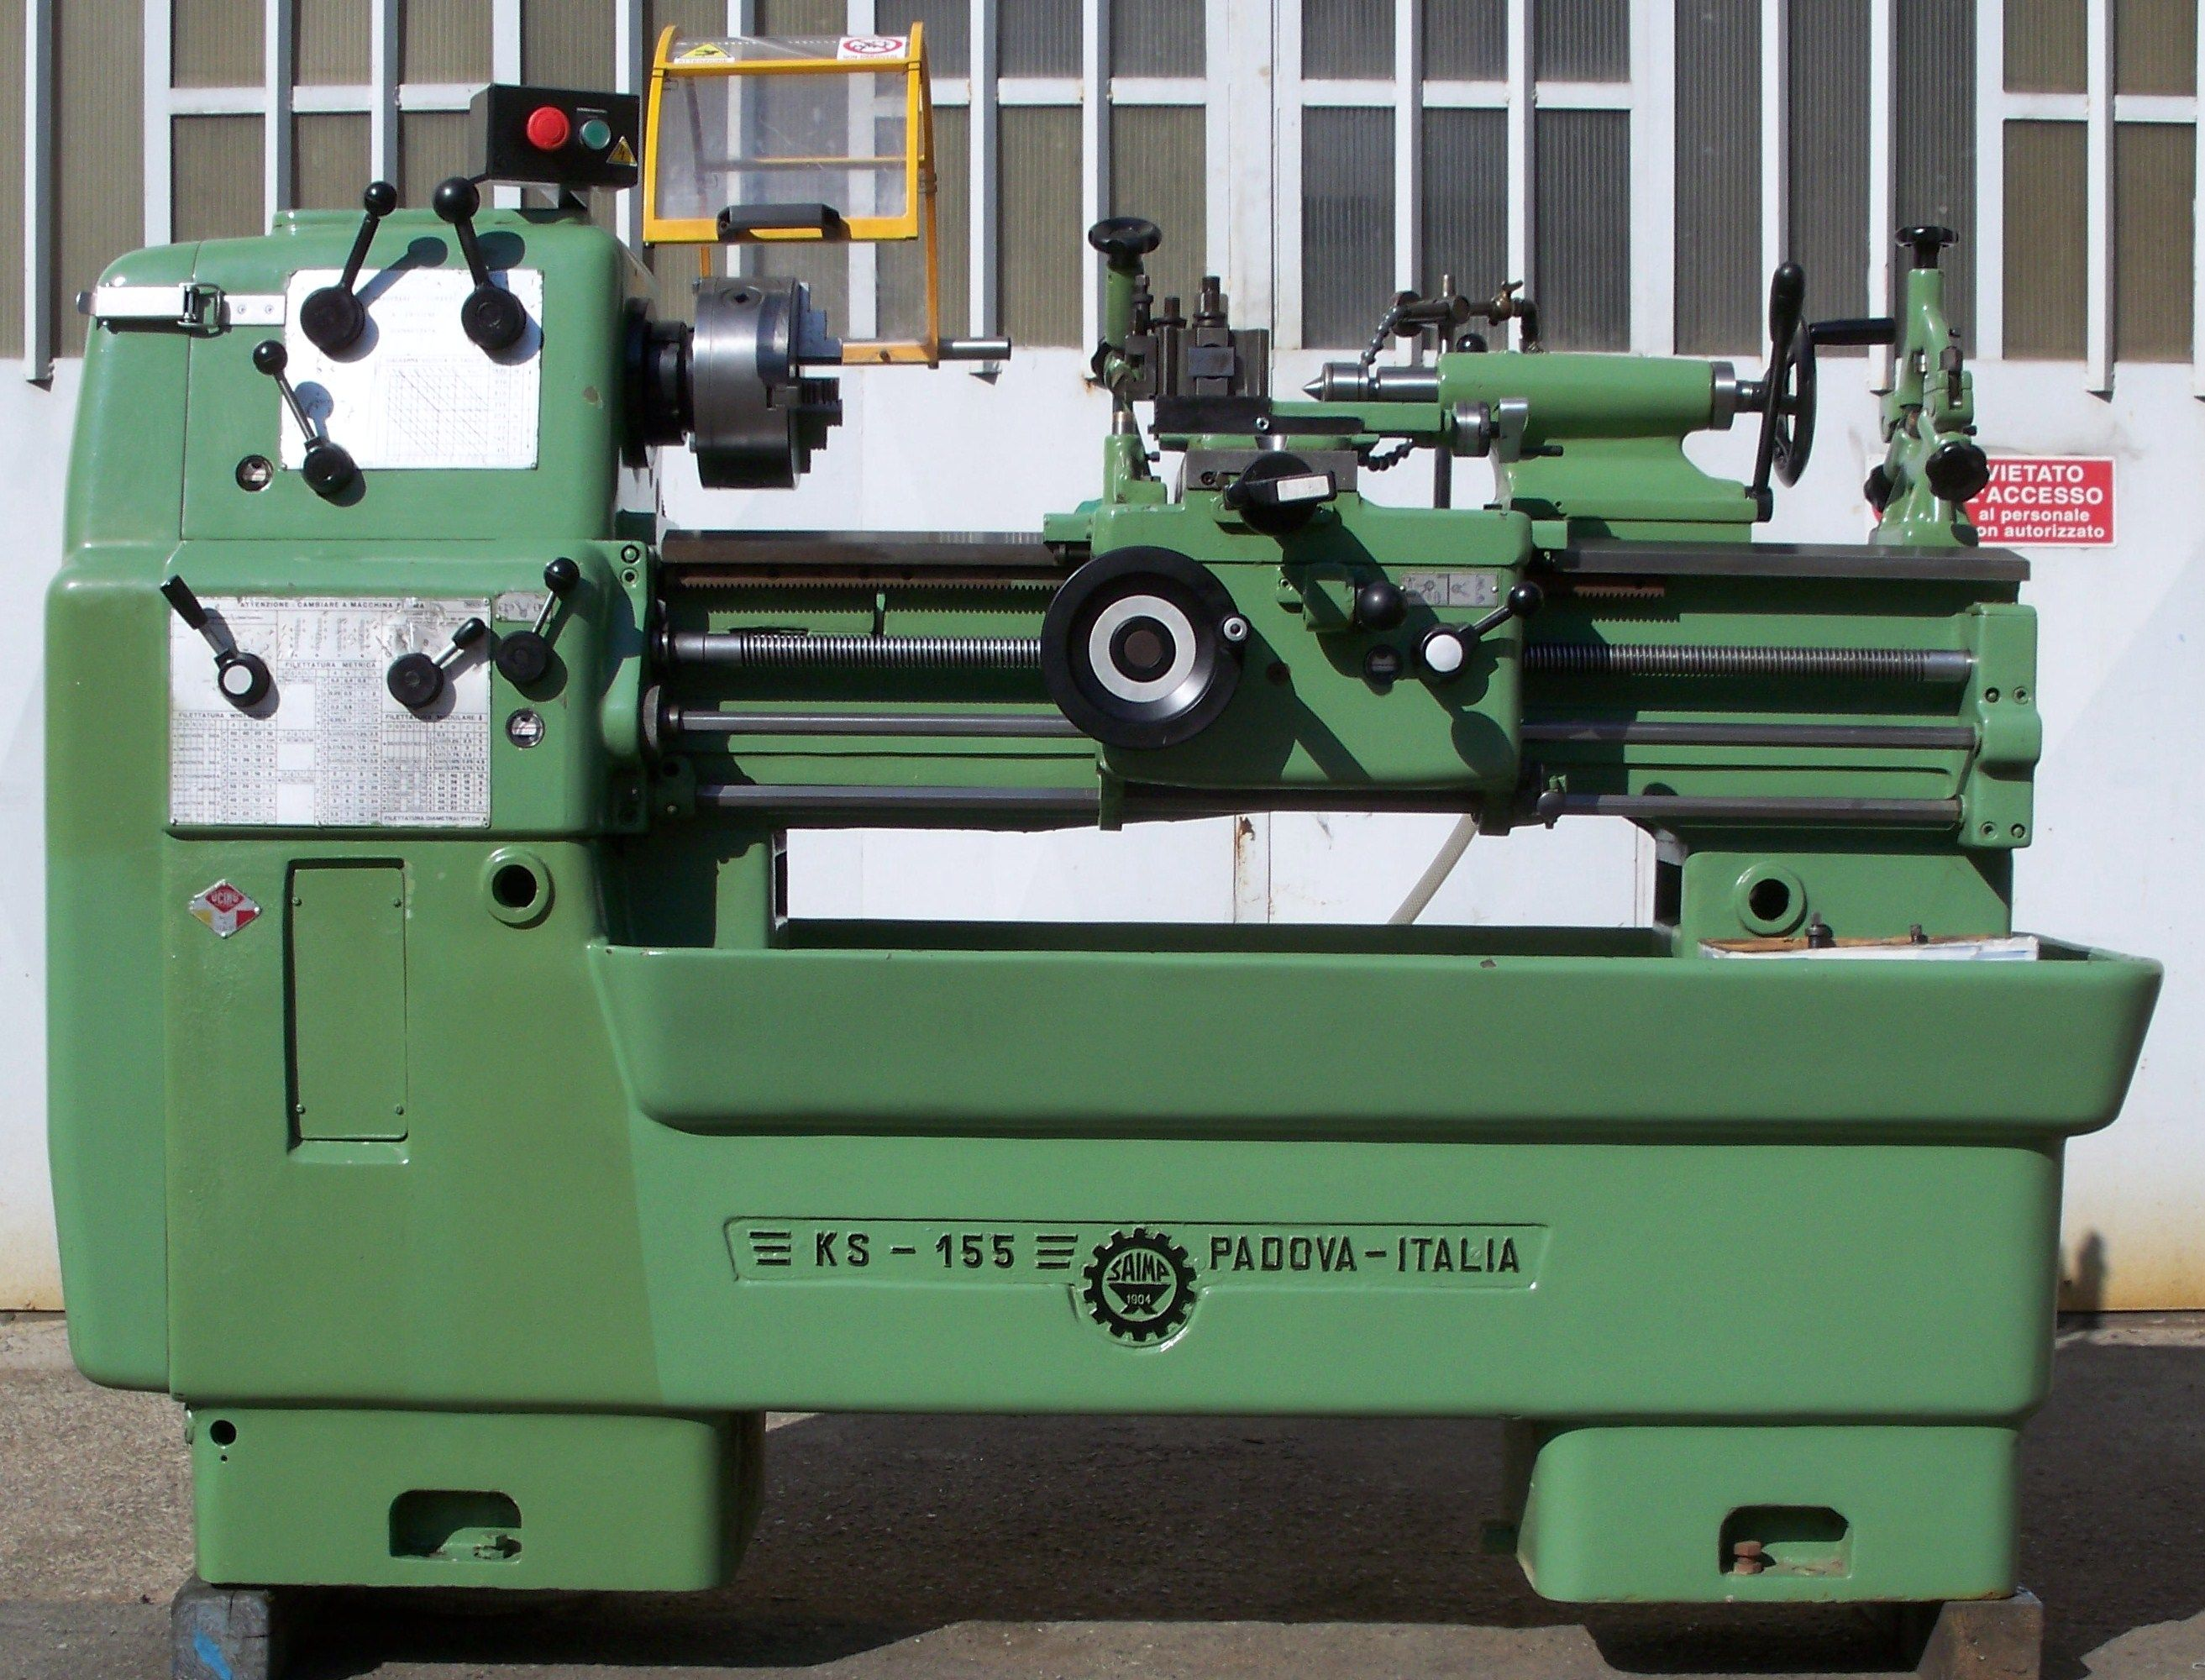 3300 euro tornio saimp ks 155 330 x 100 vendita usato for Cerco tornio